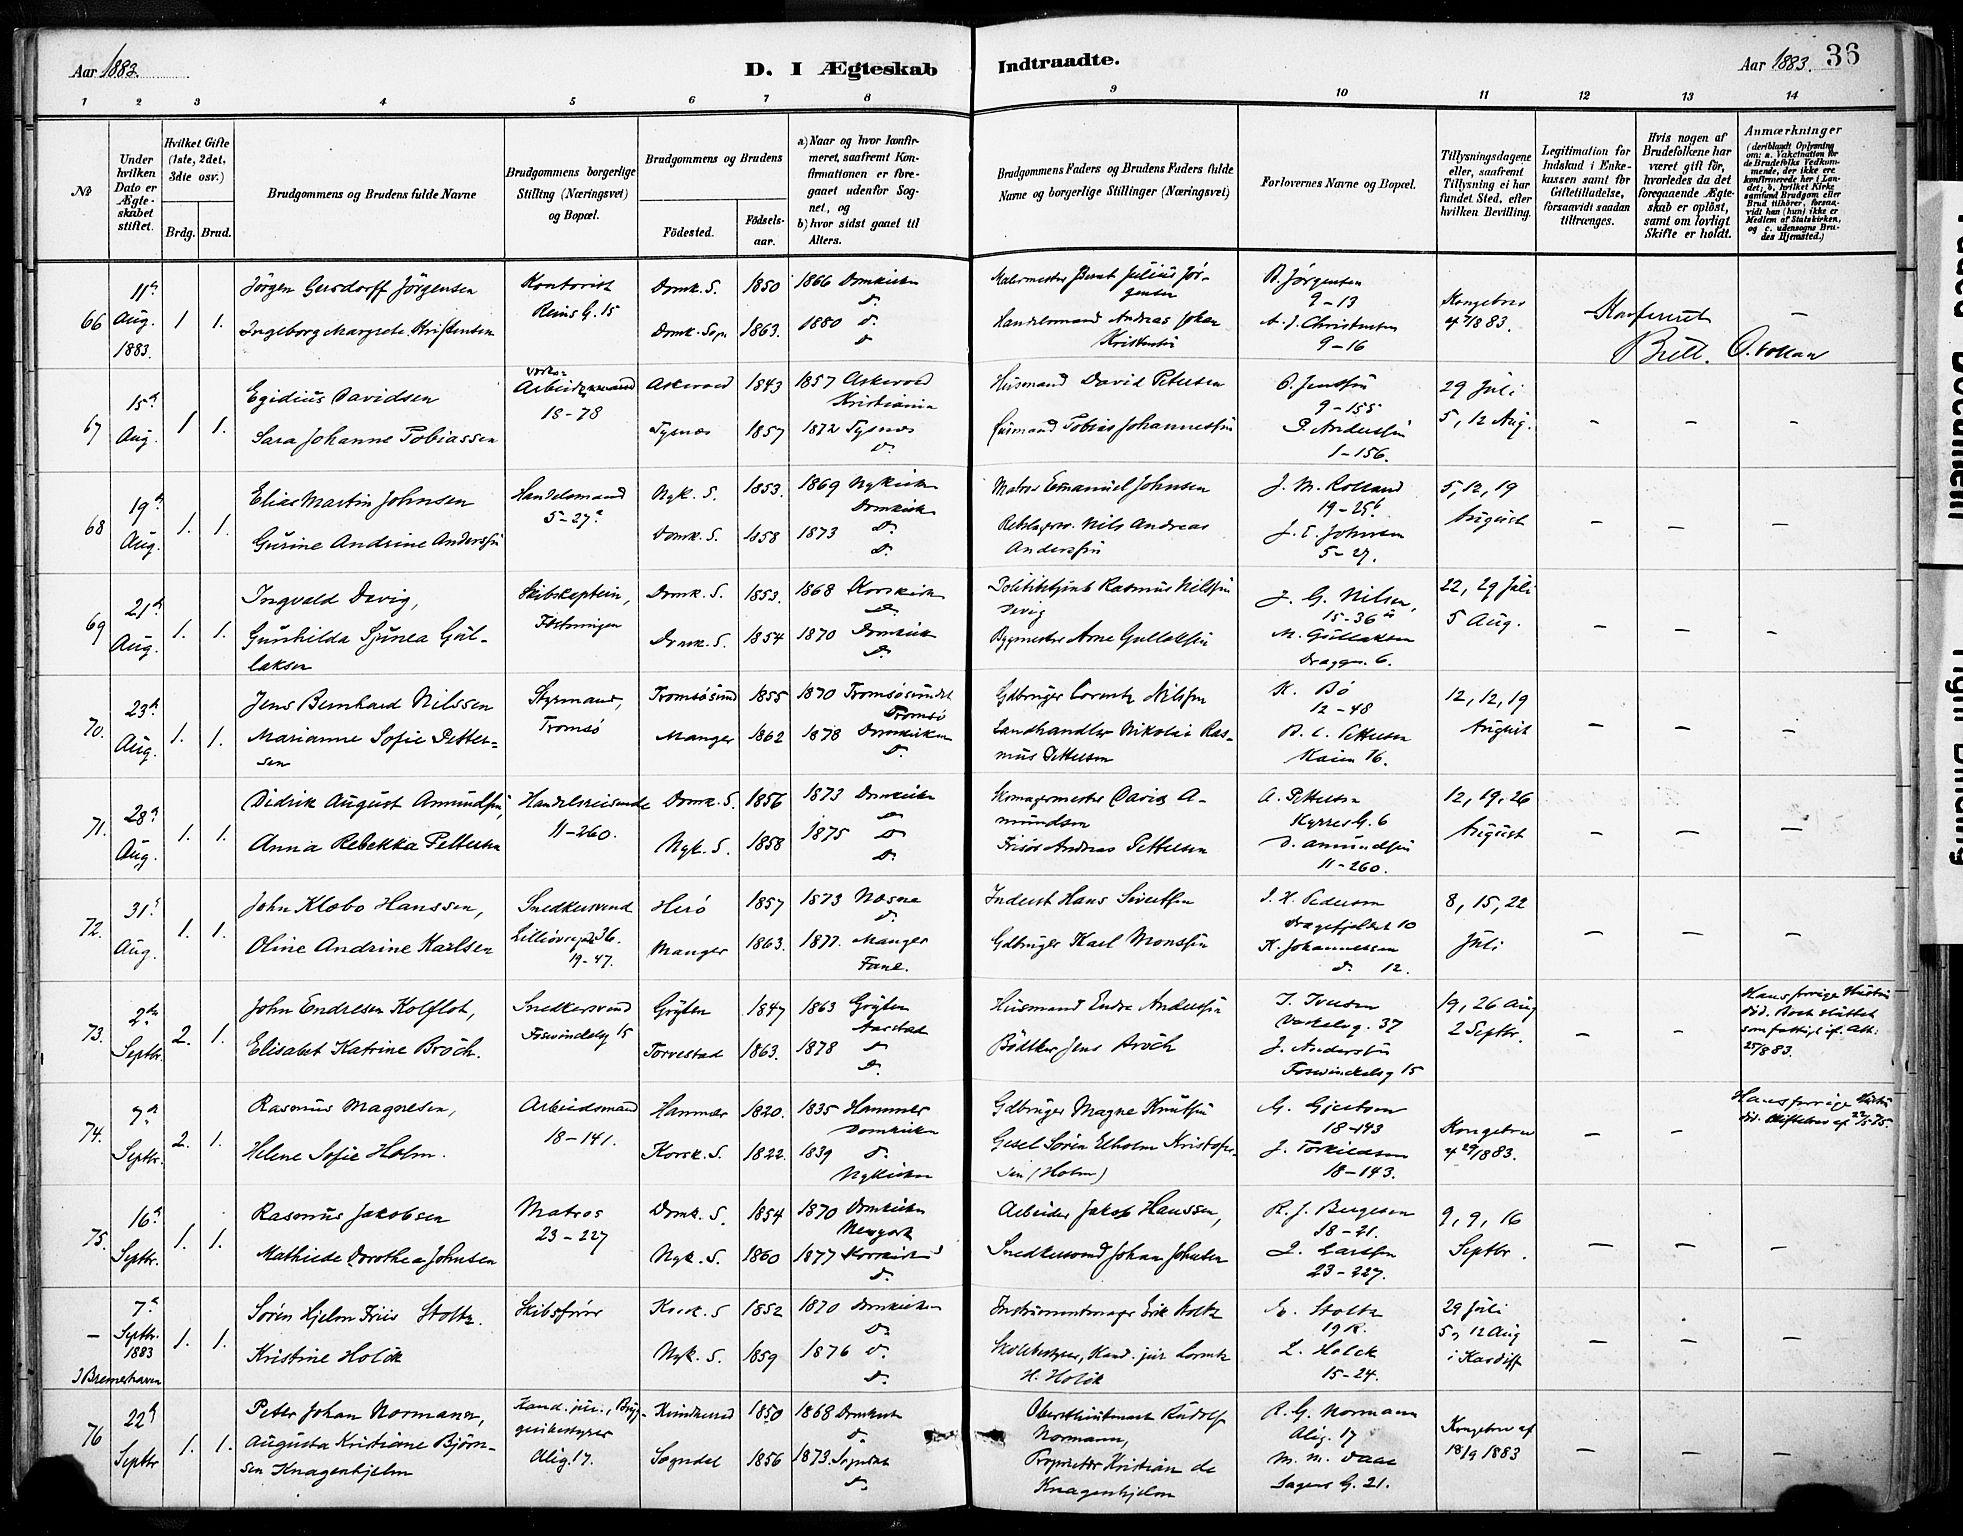 SAB, Domkirken sokneprestembete, H/Haa/L0037: Ministerialbok nr. D 4, 1880-1907, s. 36